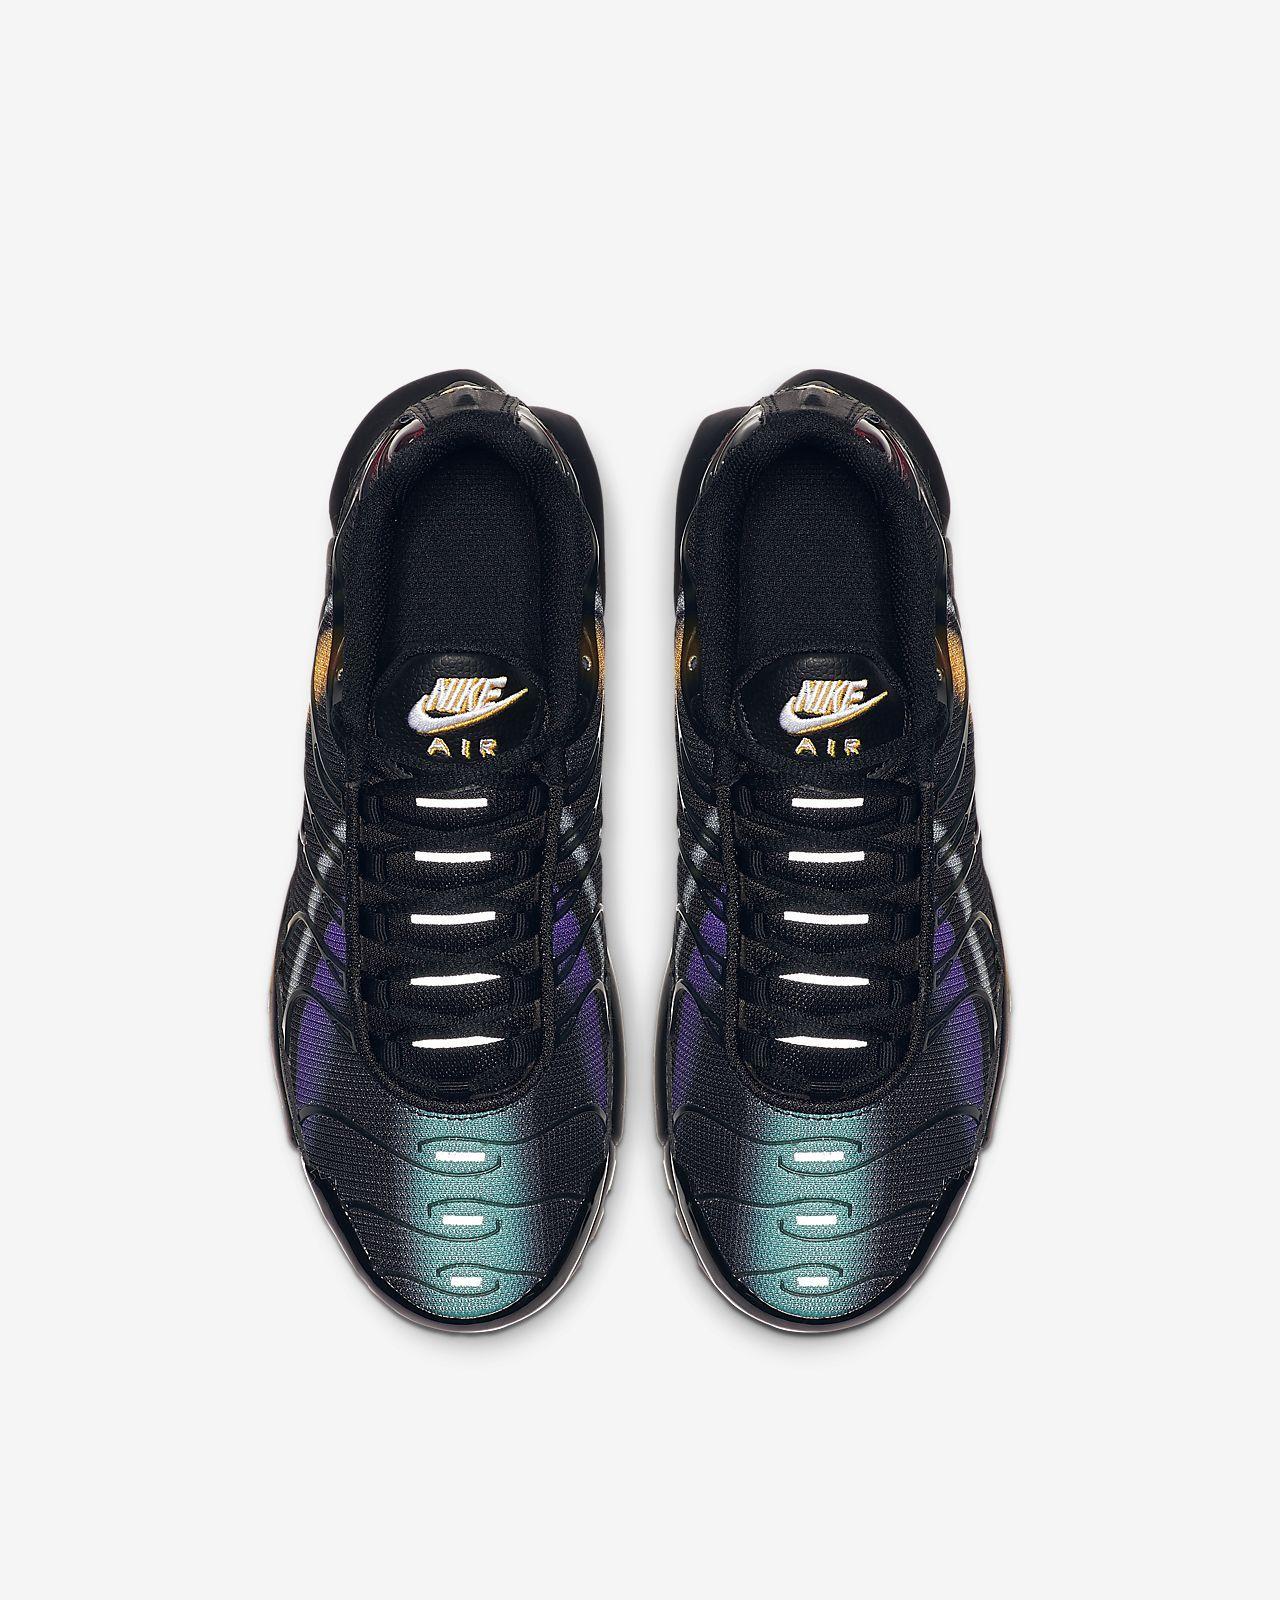 Nike Air Max Plus Game Schuh für ältere Kinder